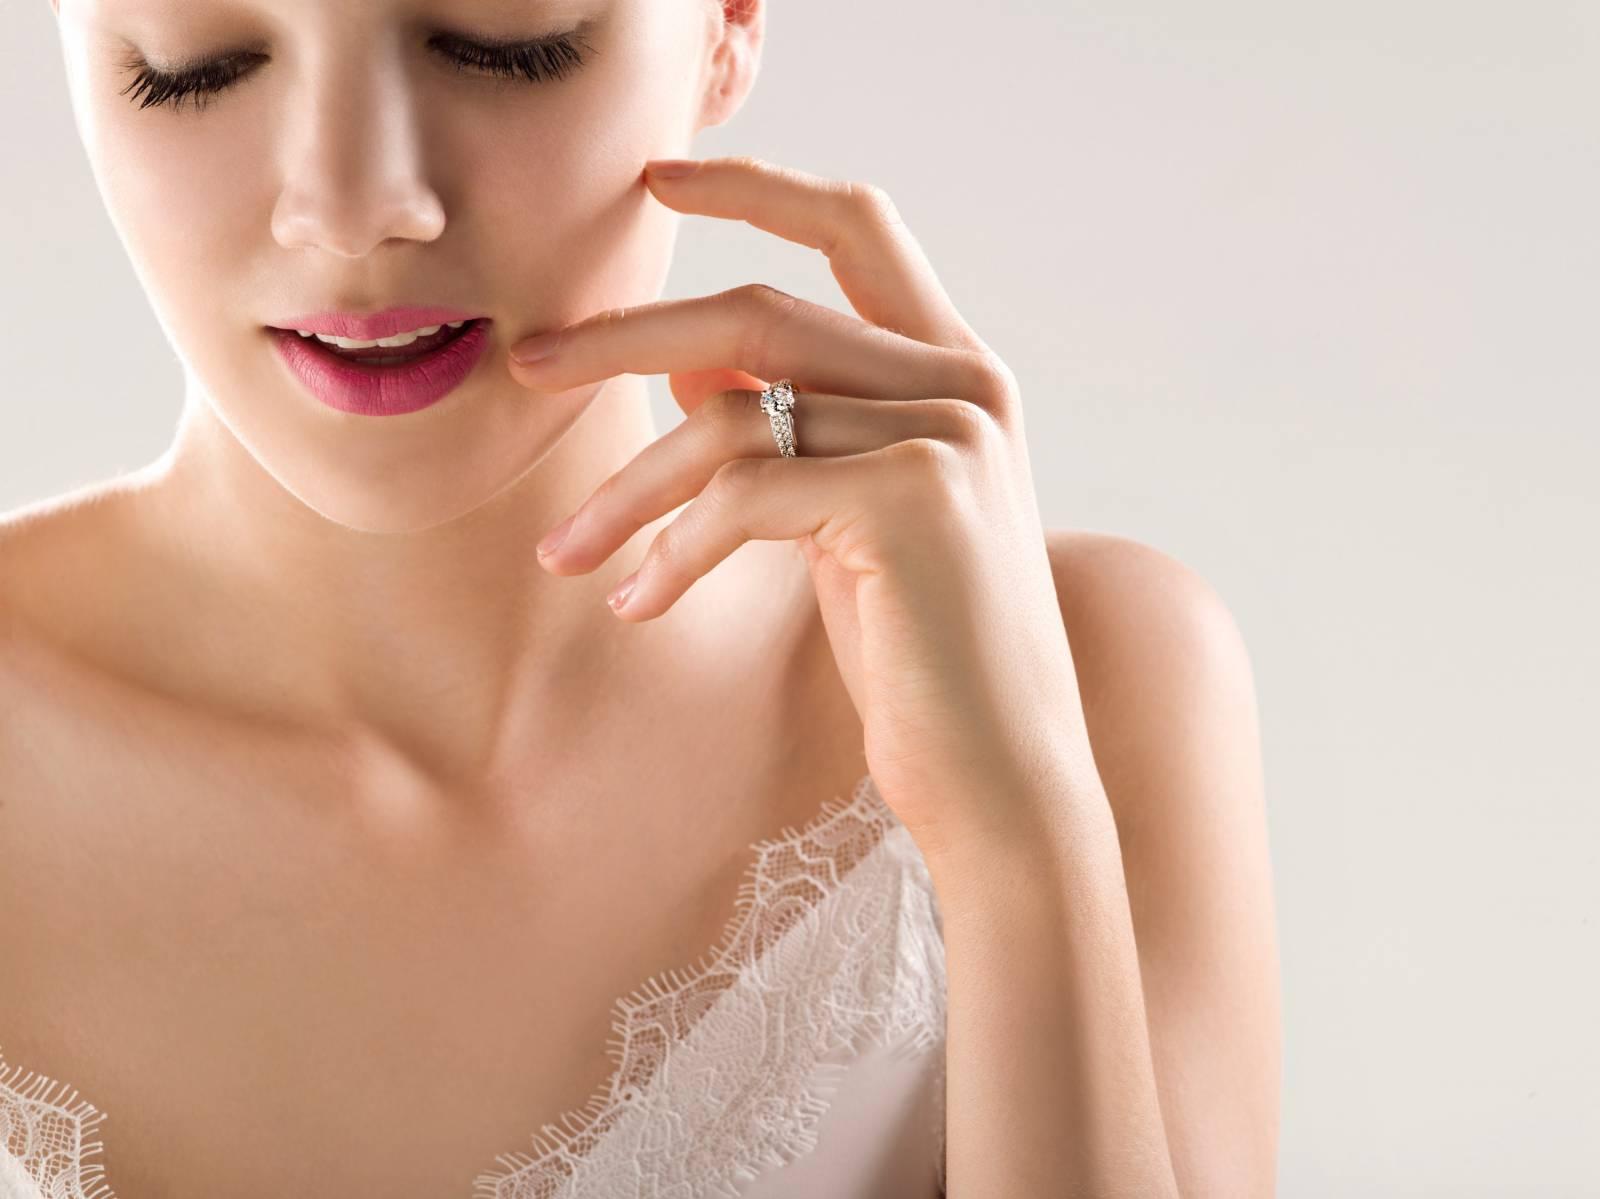 Juwelier Martens - Verlovingsringen - Trouwringen - Juwelen huwelijk - House of Weddings - 8